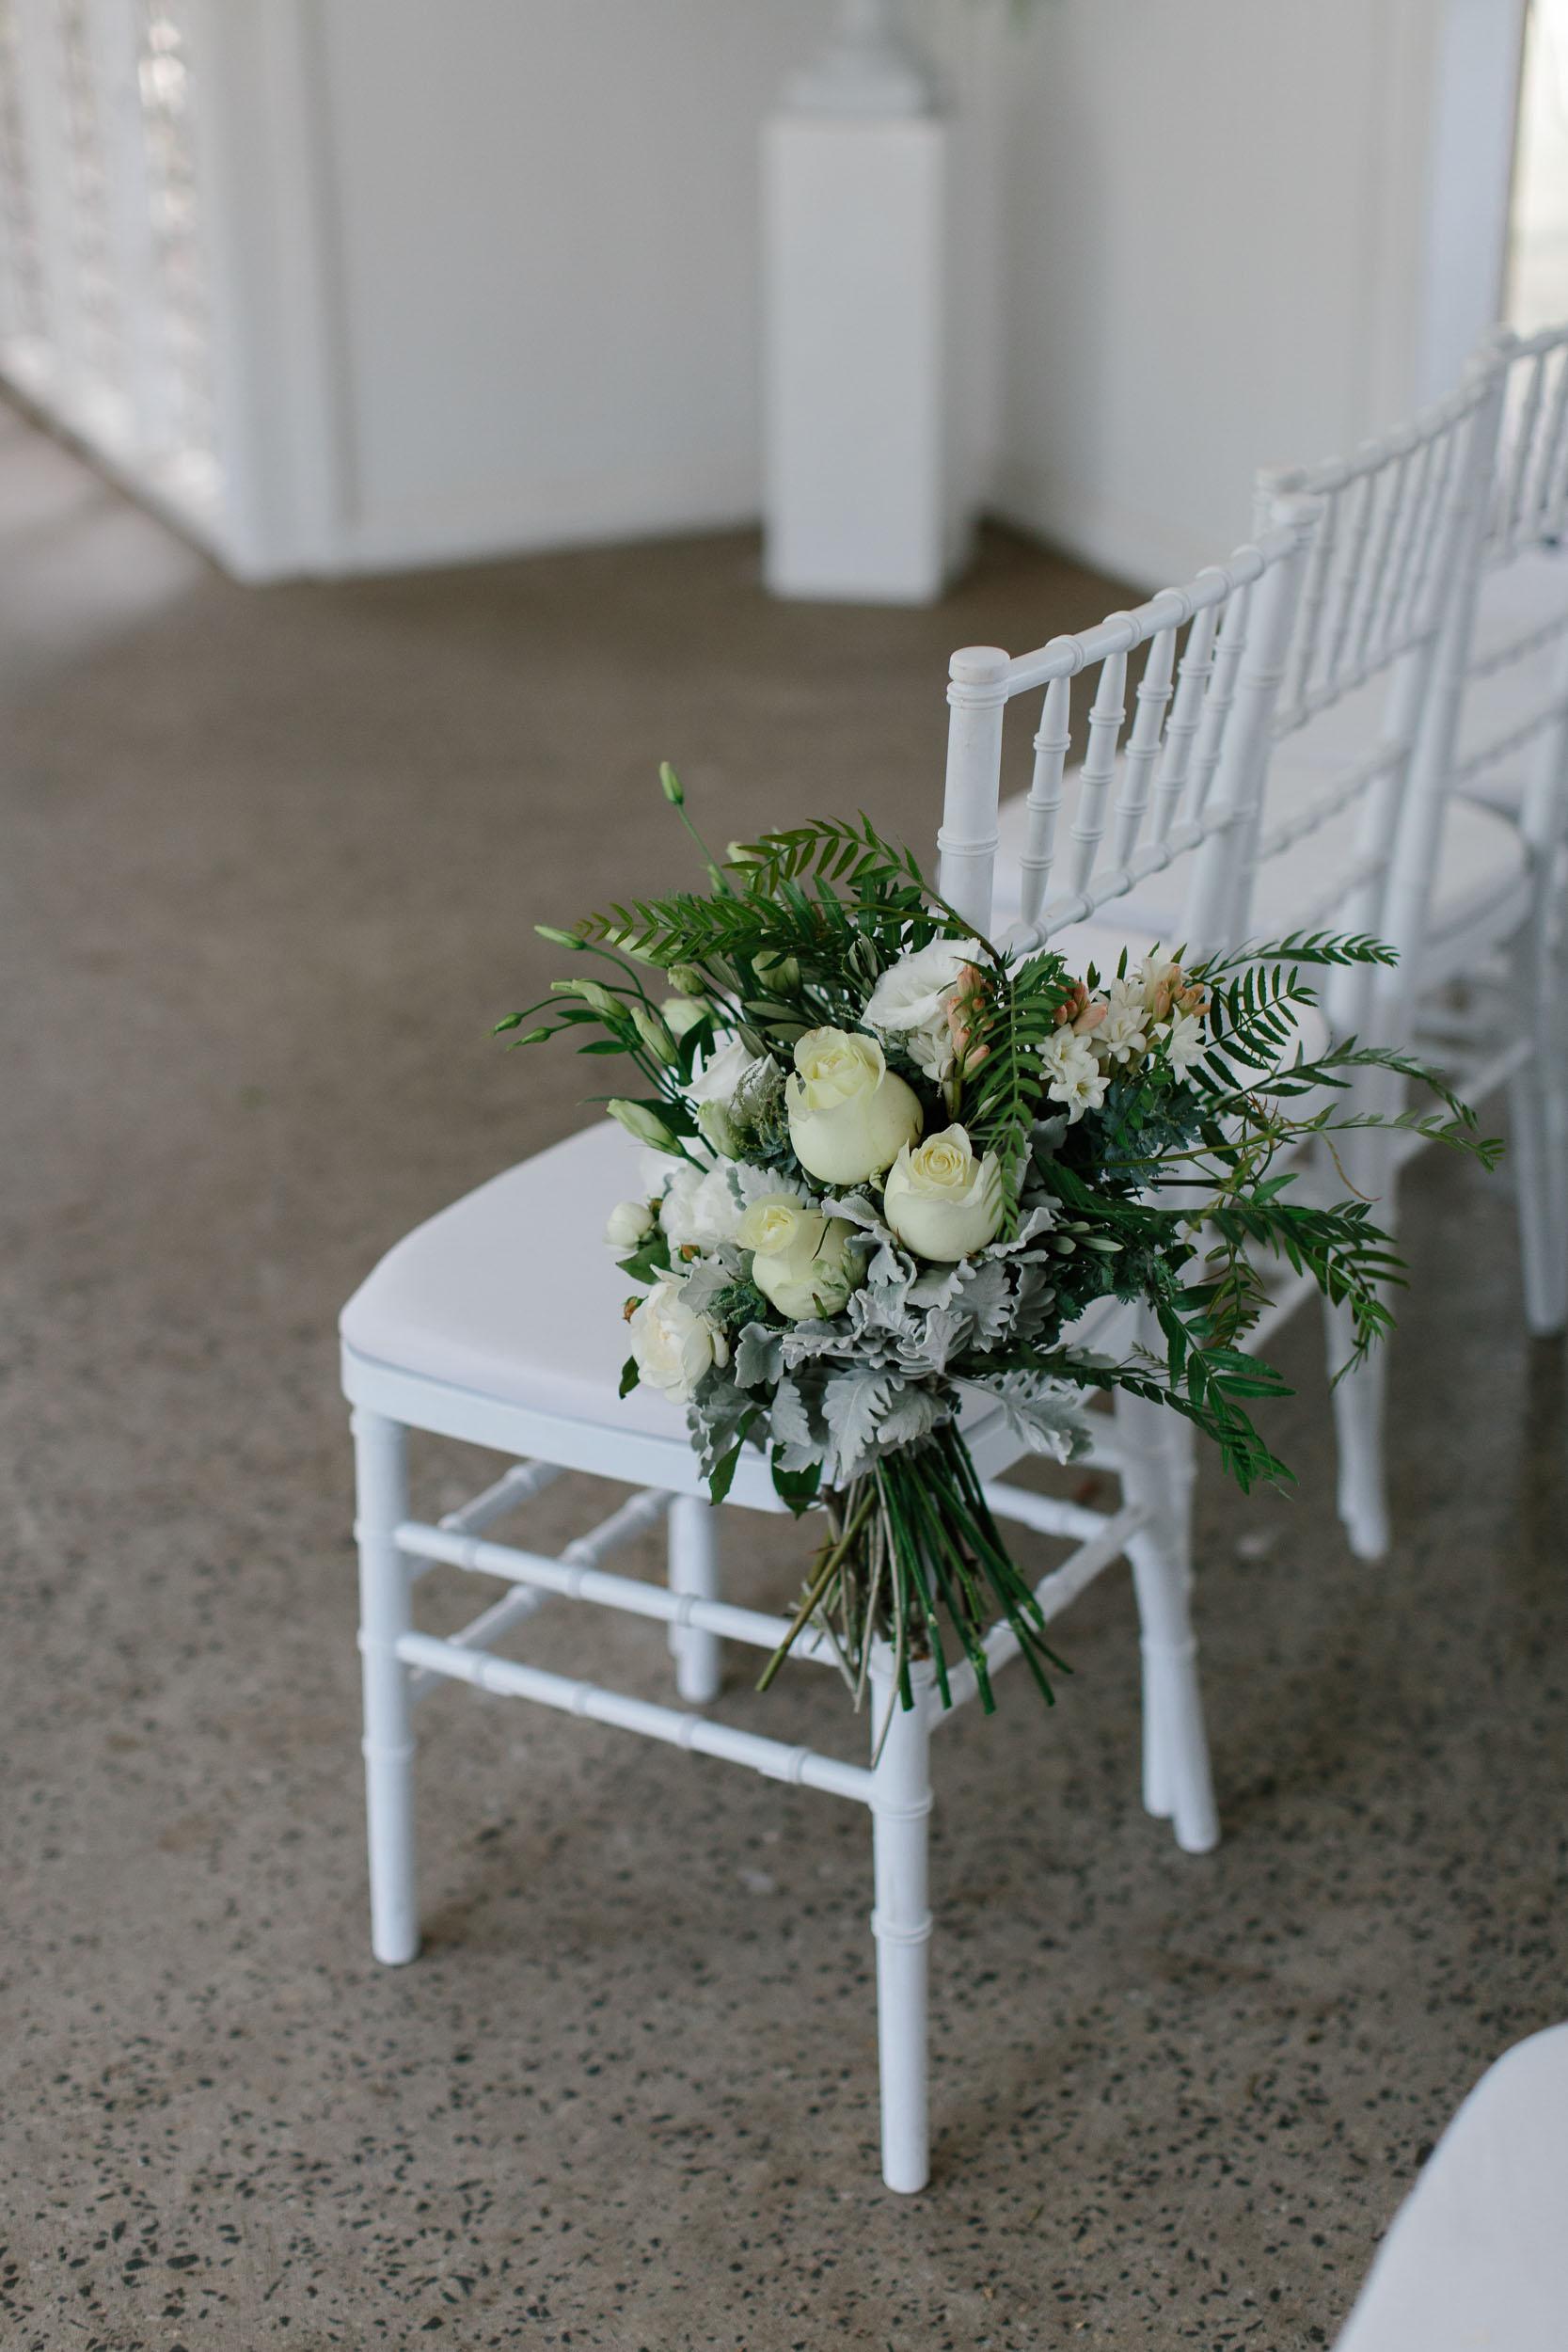 Kas-Richards-Mornington-Peninsula-Private-Property-Wedding-Marianna-Hardwick-Gown-145.jpg